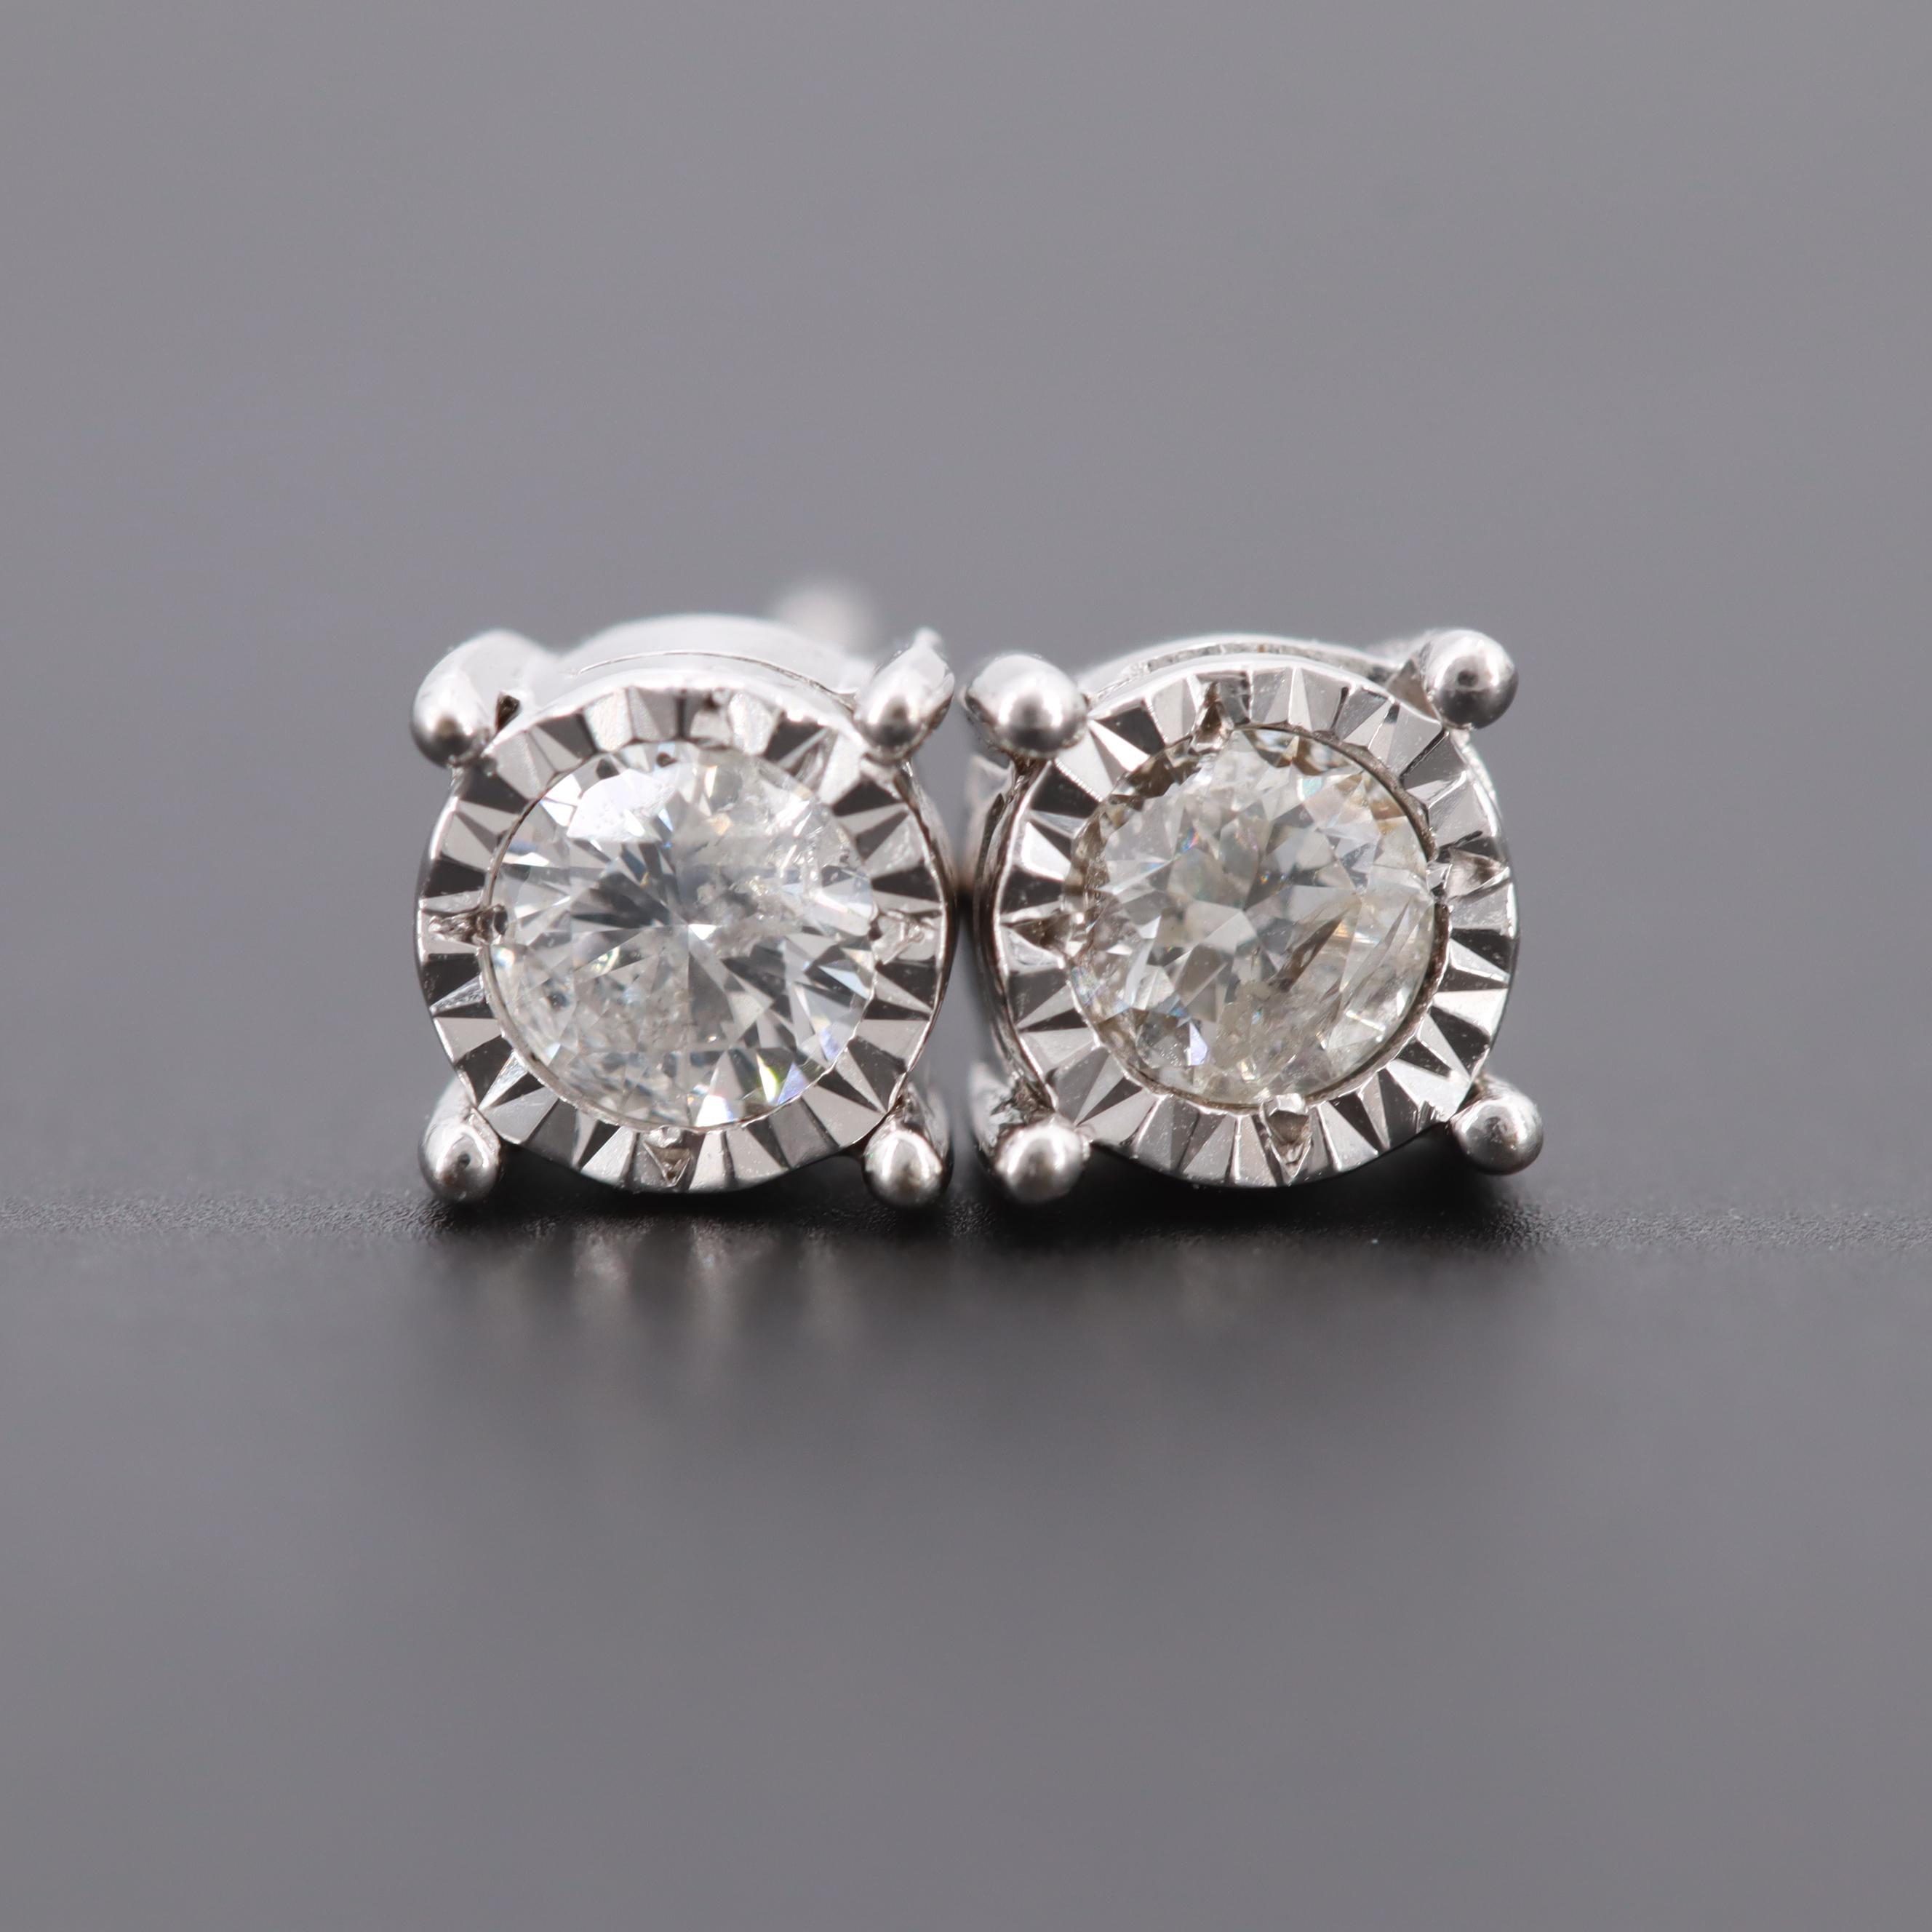 10K White Gold Round Brilliant Cut Diamond Stud Earrings